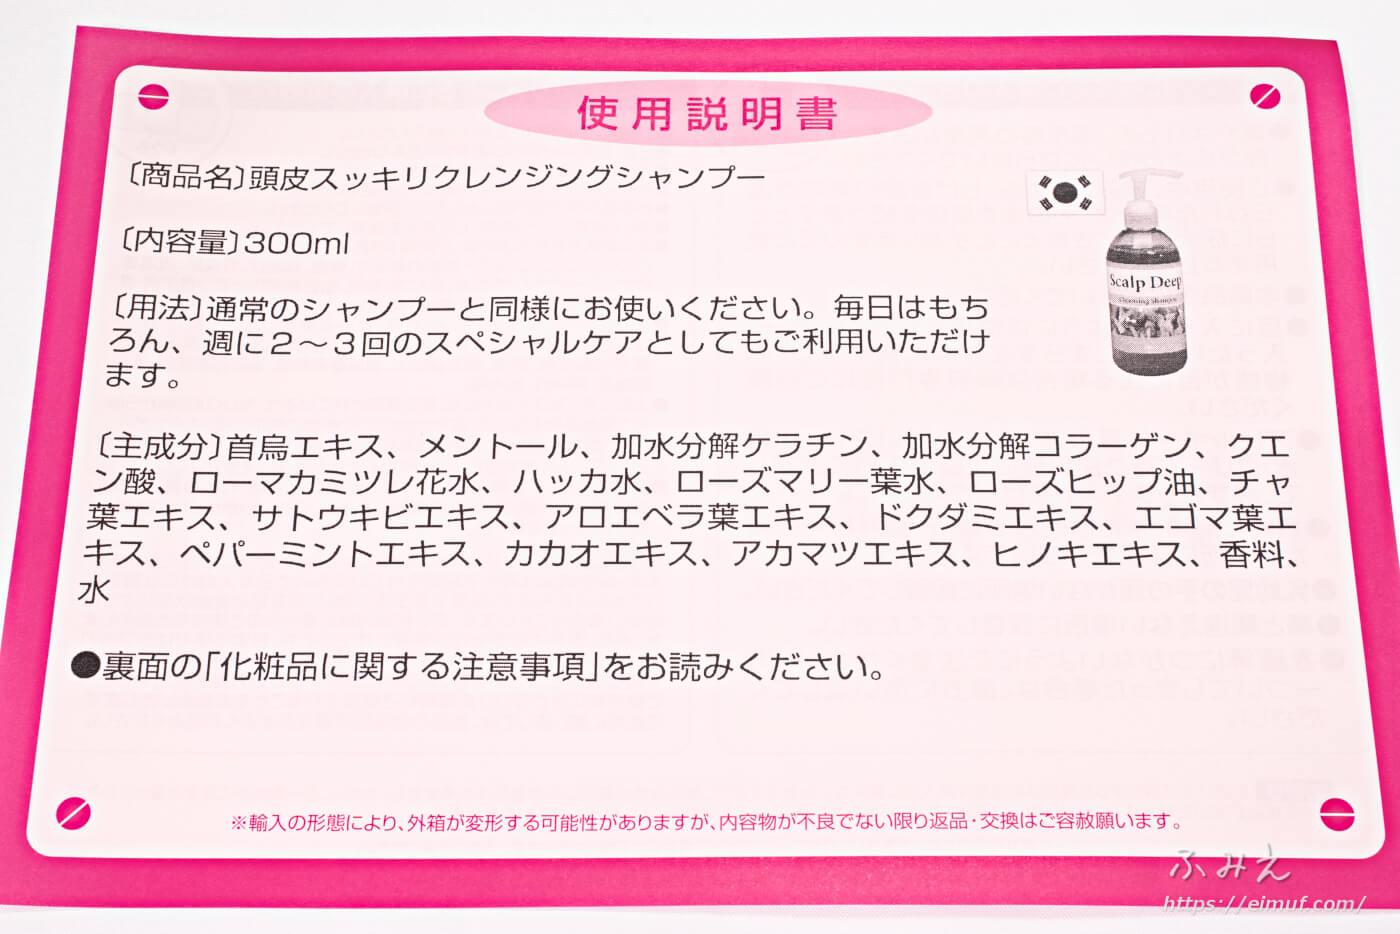 YOUUP(ユーアップ) 頭皮スッキリクレンジングシャンプー 付属の使用説明書